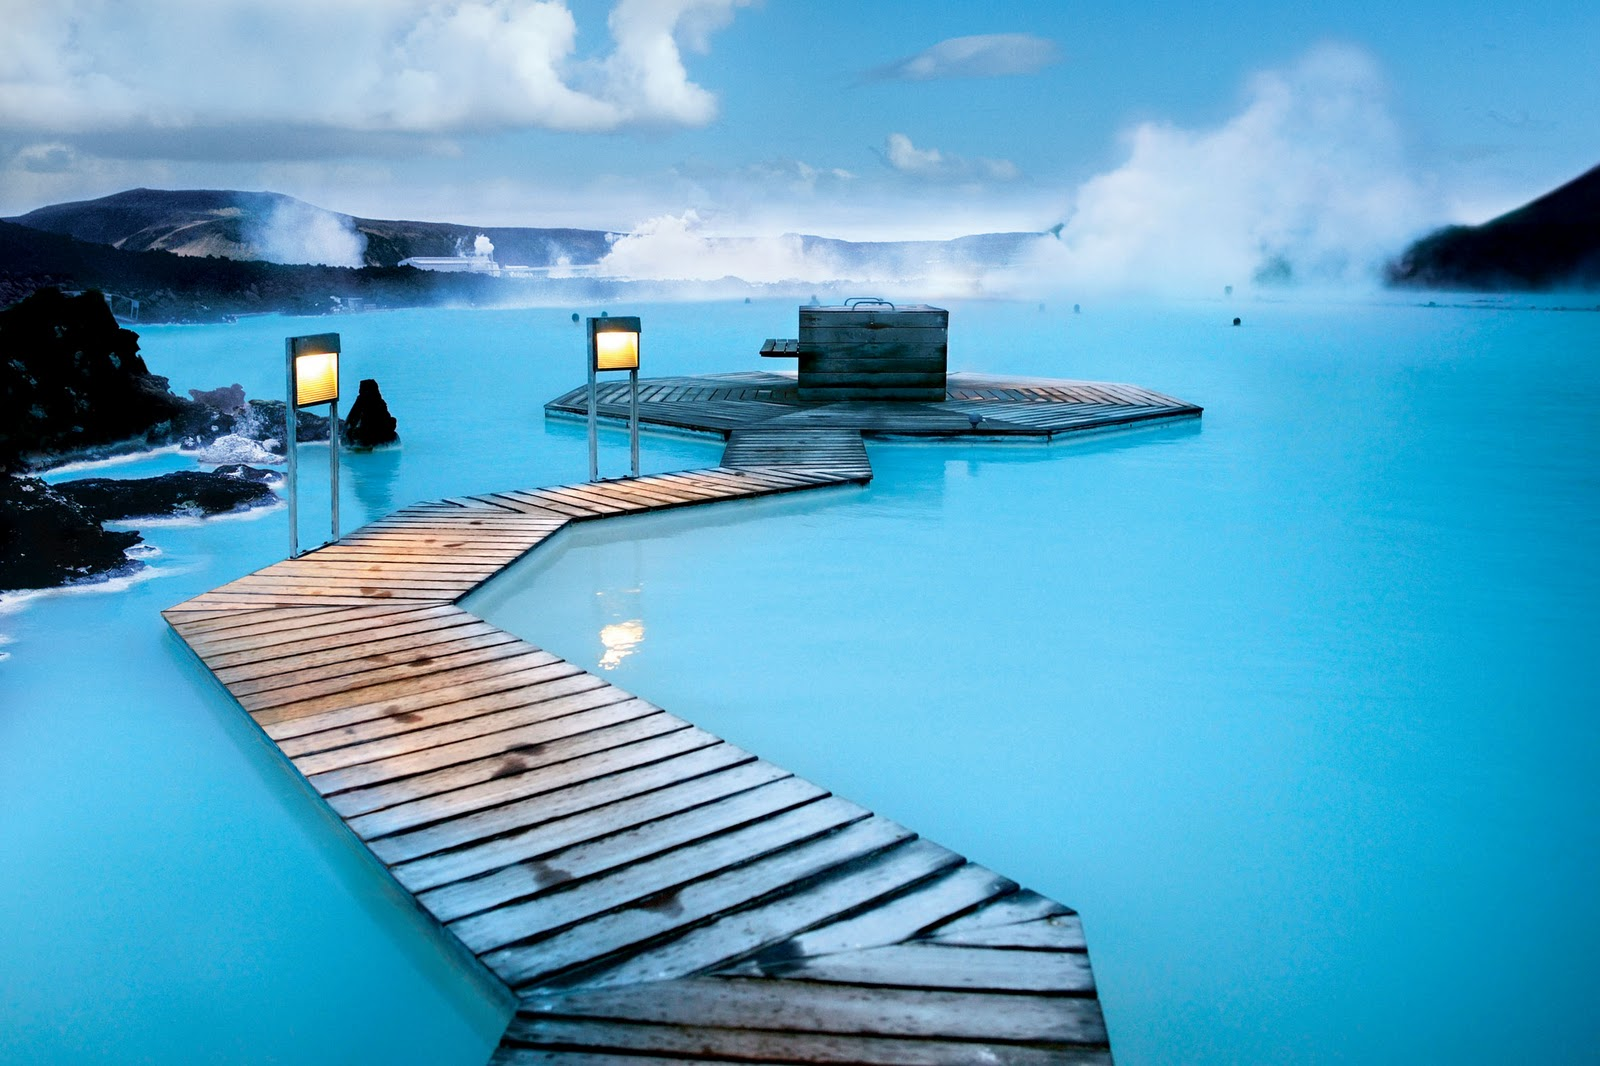 4-day-winter-adventure-blue-lagoon-the-golden-circle-snowmobiling-northern-lights-0.jpg